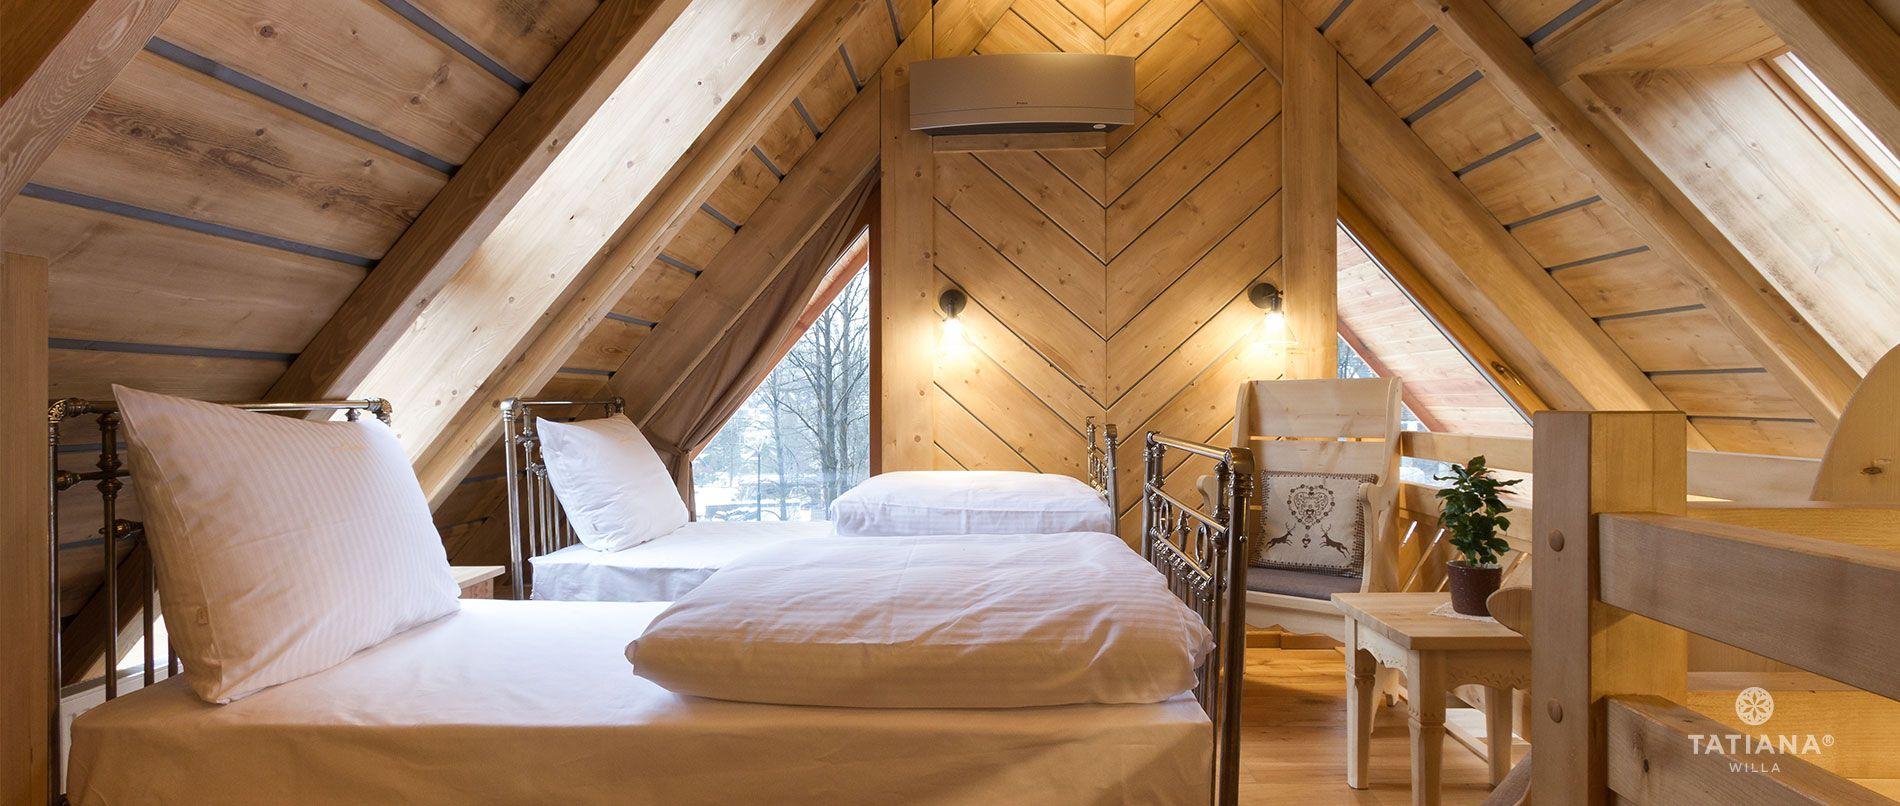 Apartament Stary Smrekowy - druga sypialnia